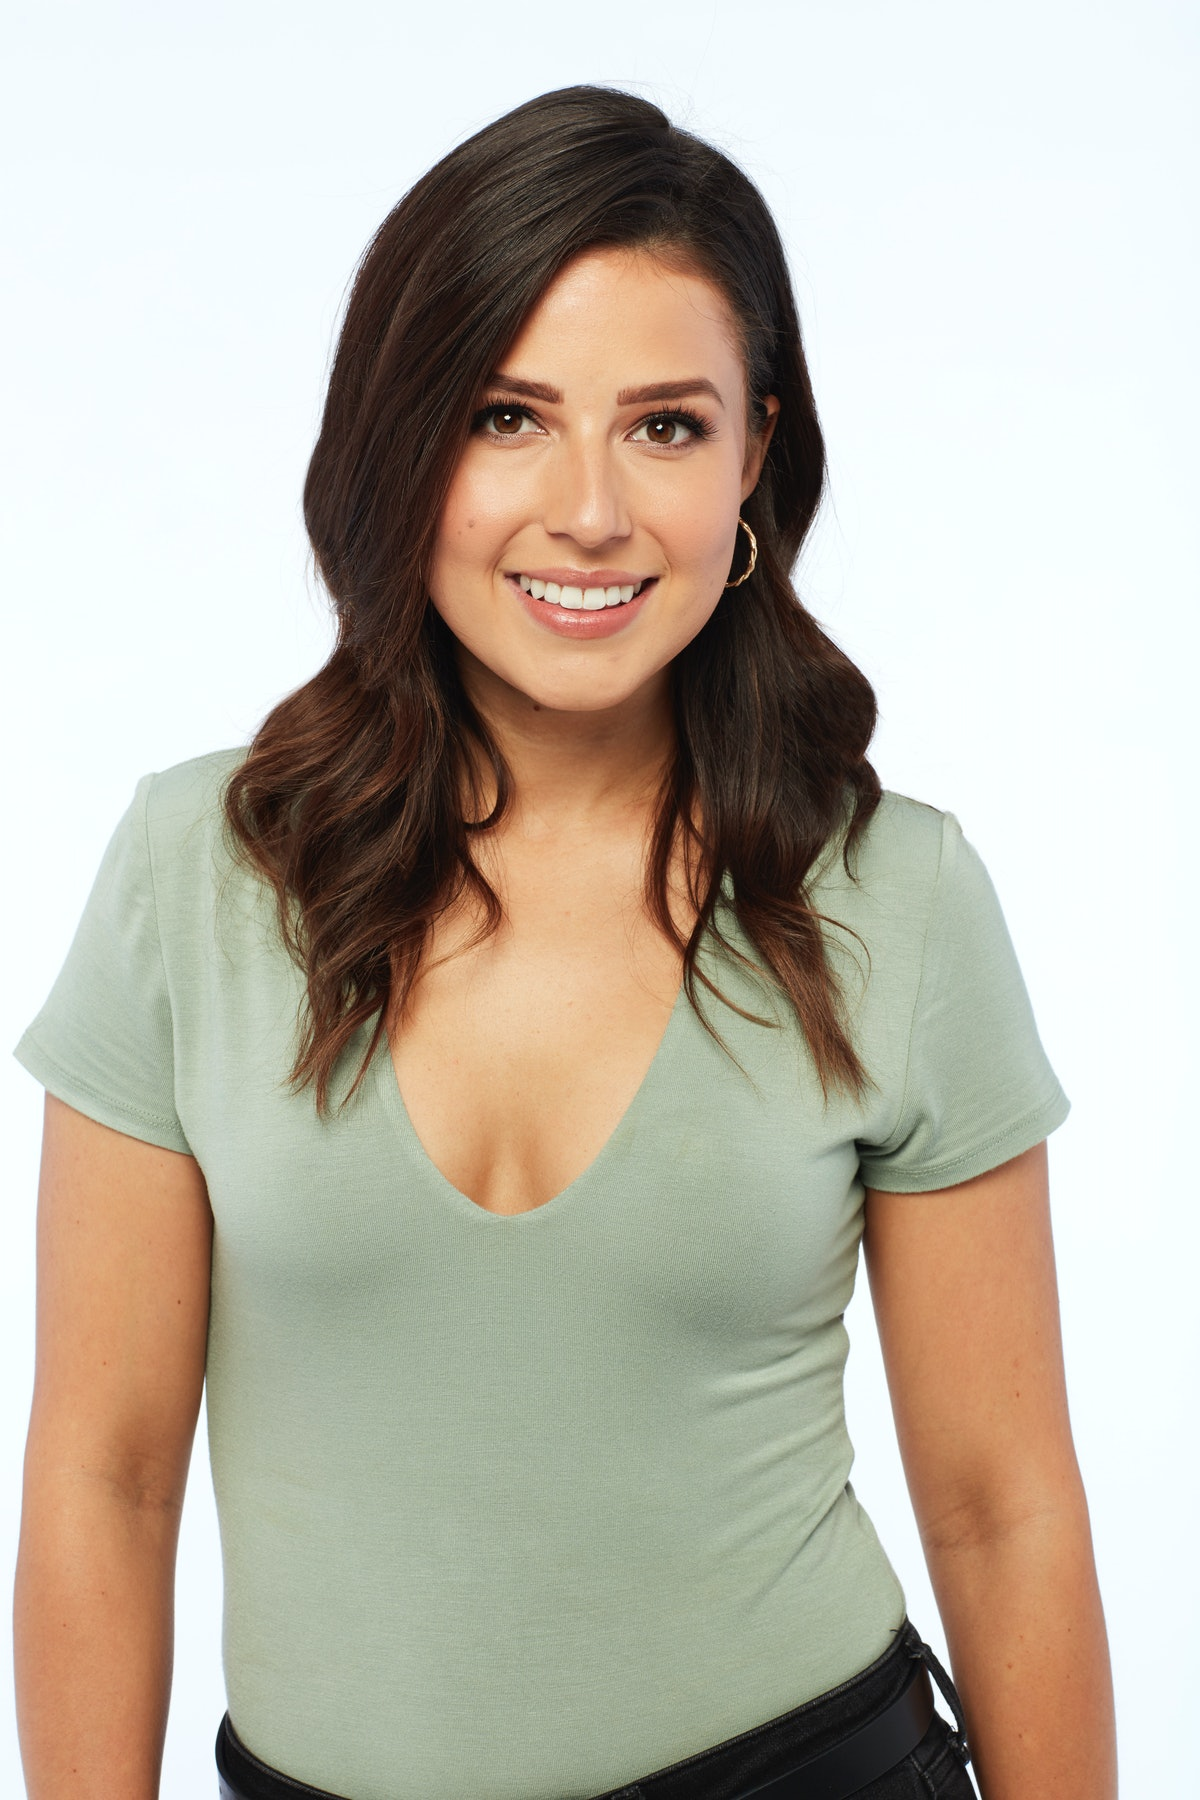 Who Is Katie On Matt's 'Bachelor' Season?